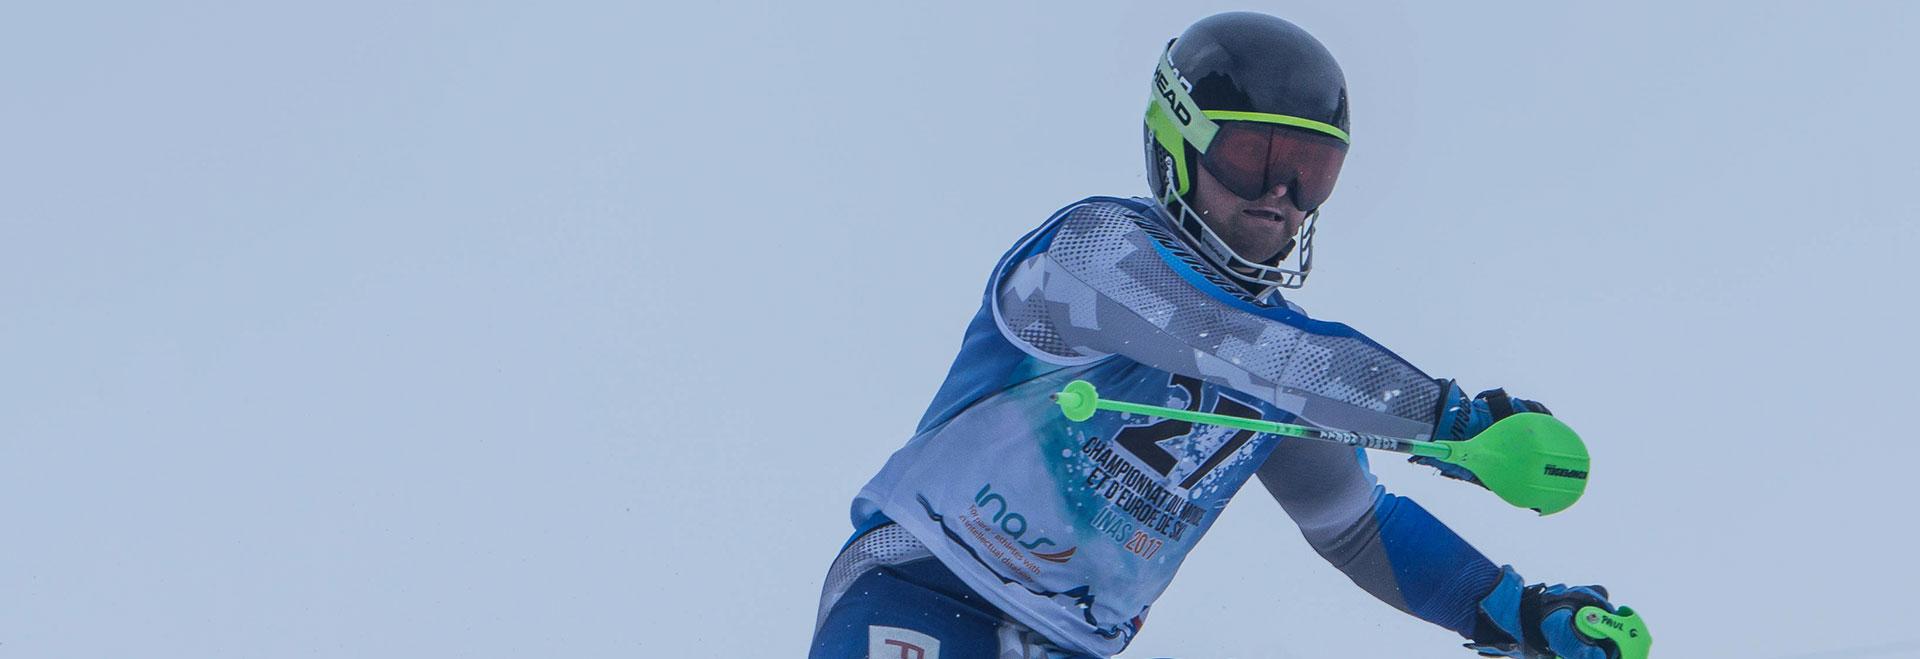 Ski Handicap Ligue du Sport Adapté Auvergne Rhône-Alpes